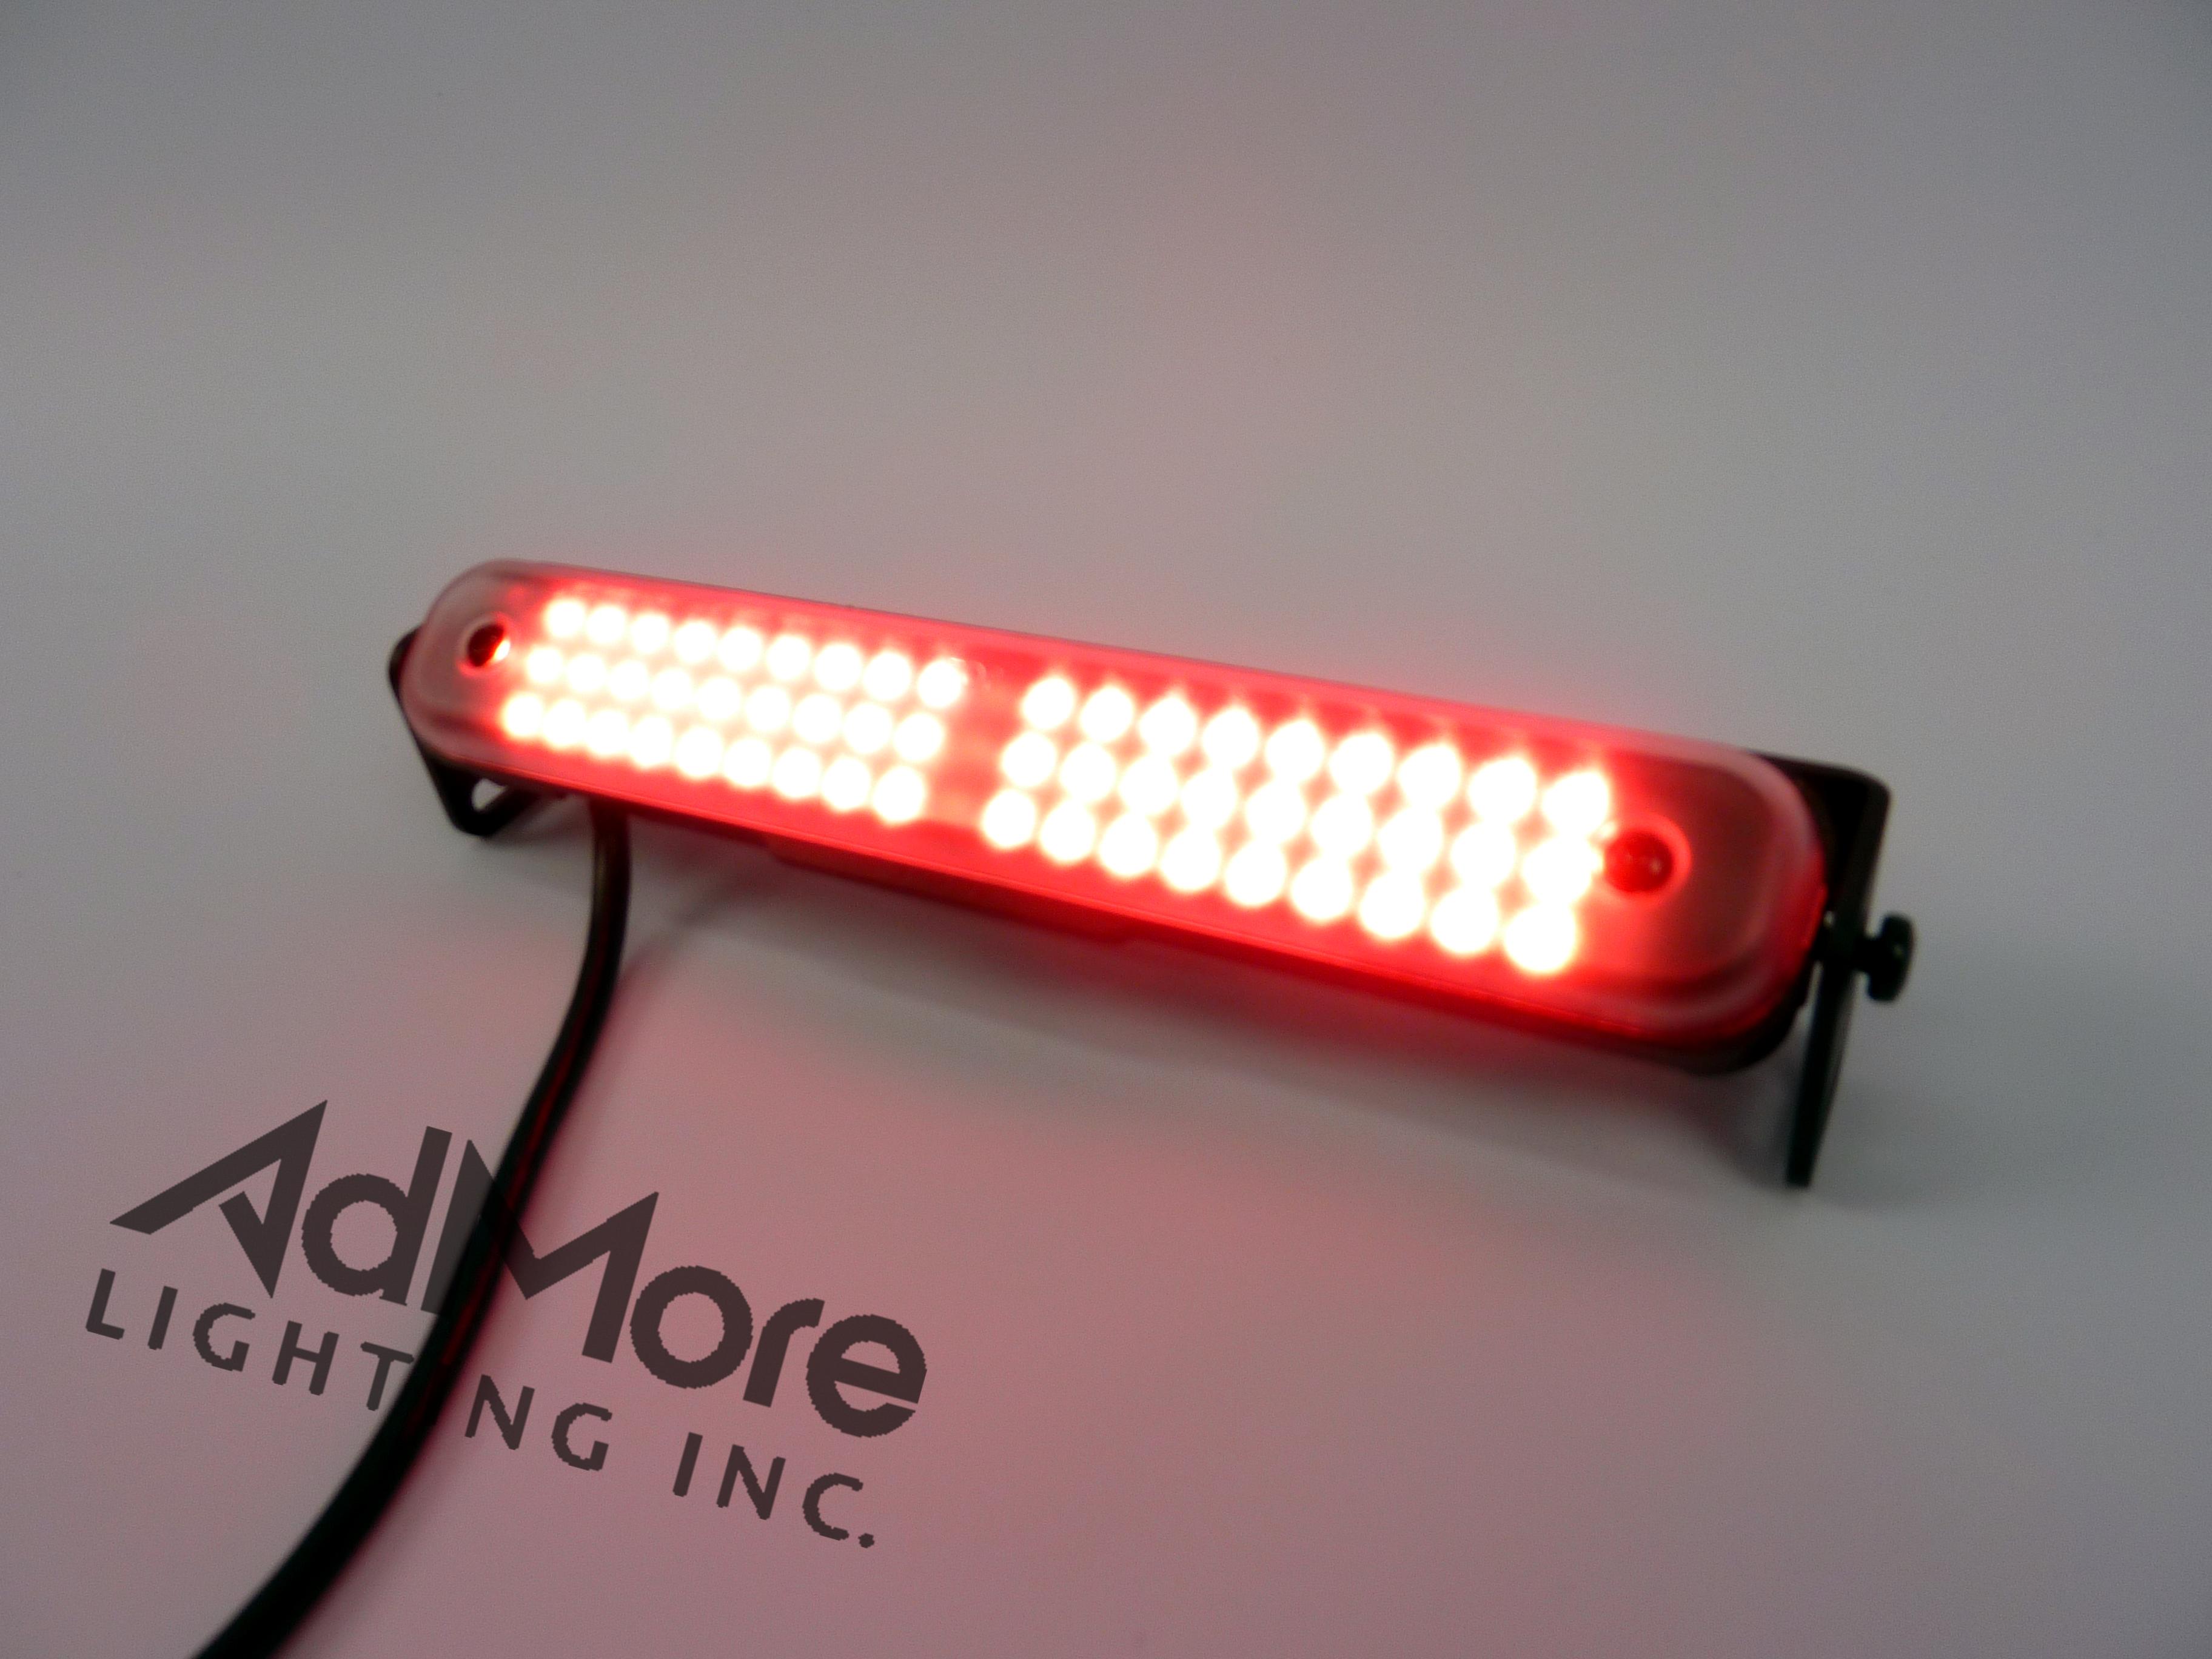 Motorcycle Deceleration Light Bar Admore Lighting Inc Bar Lighting Strobe Lights Lighting Inc